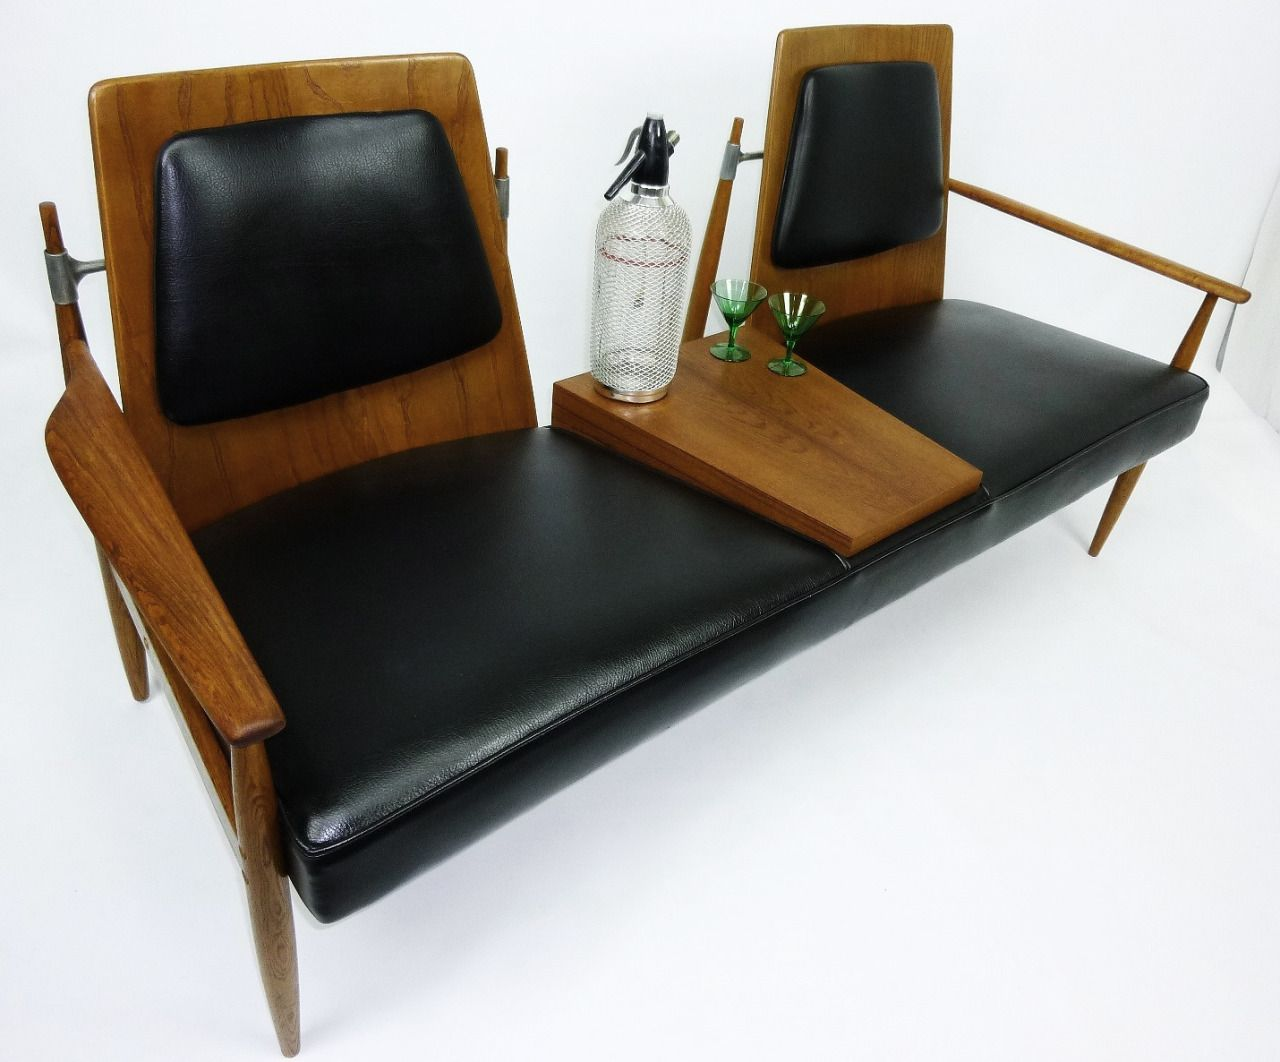 vintage 2 seat bench with built in center table design via rh pinterest com